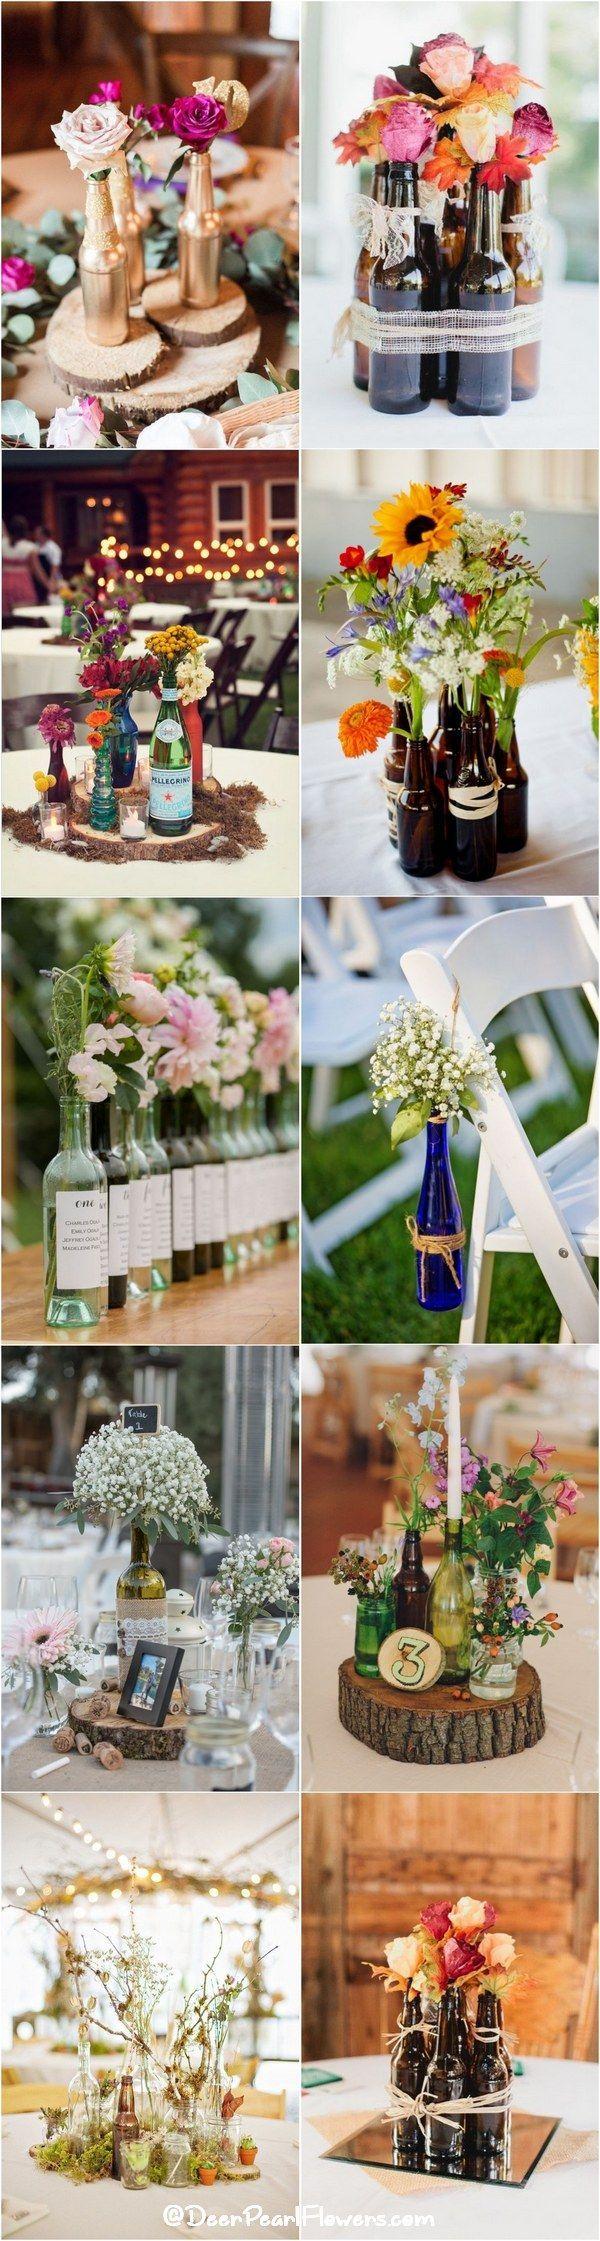 Wedding decorations with wine bottles  Wine bottle vineyard wedding ideas  erpearlflowers